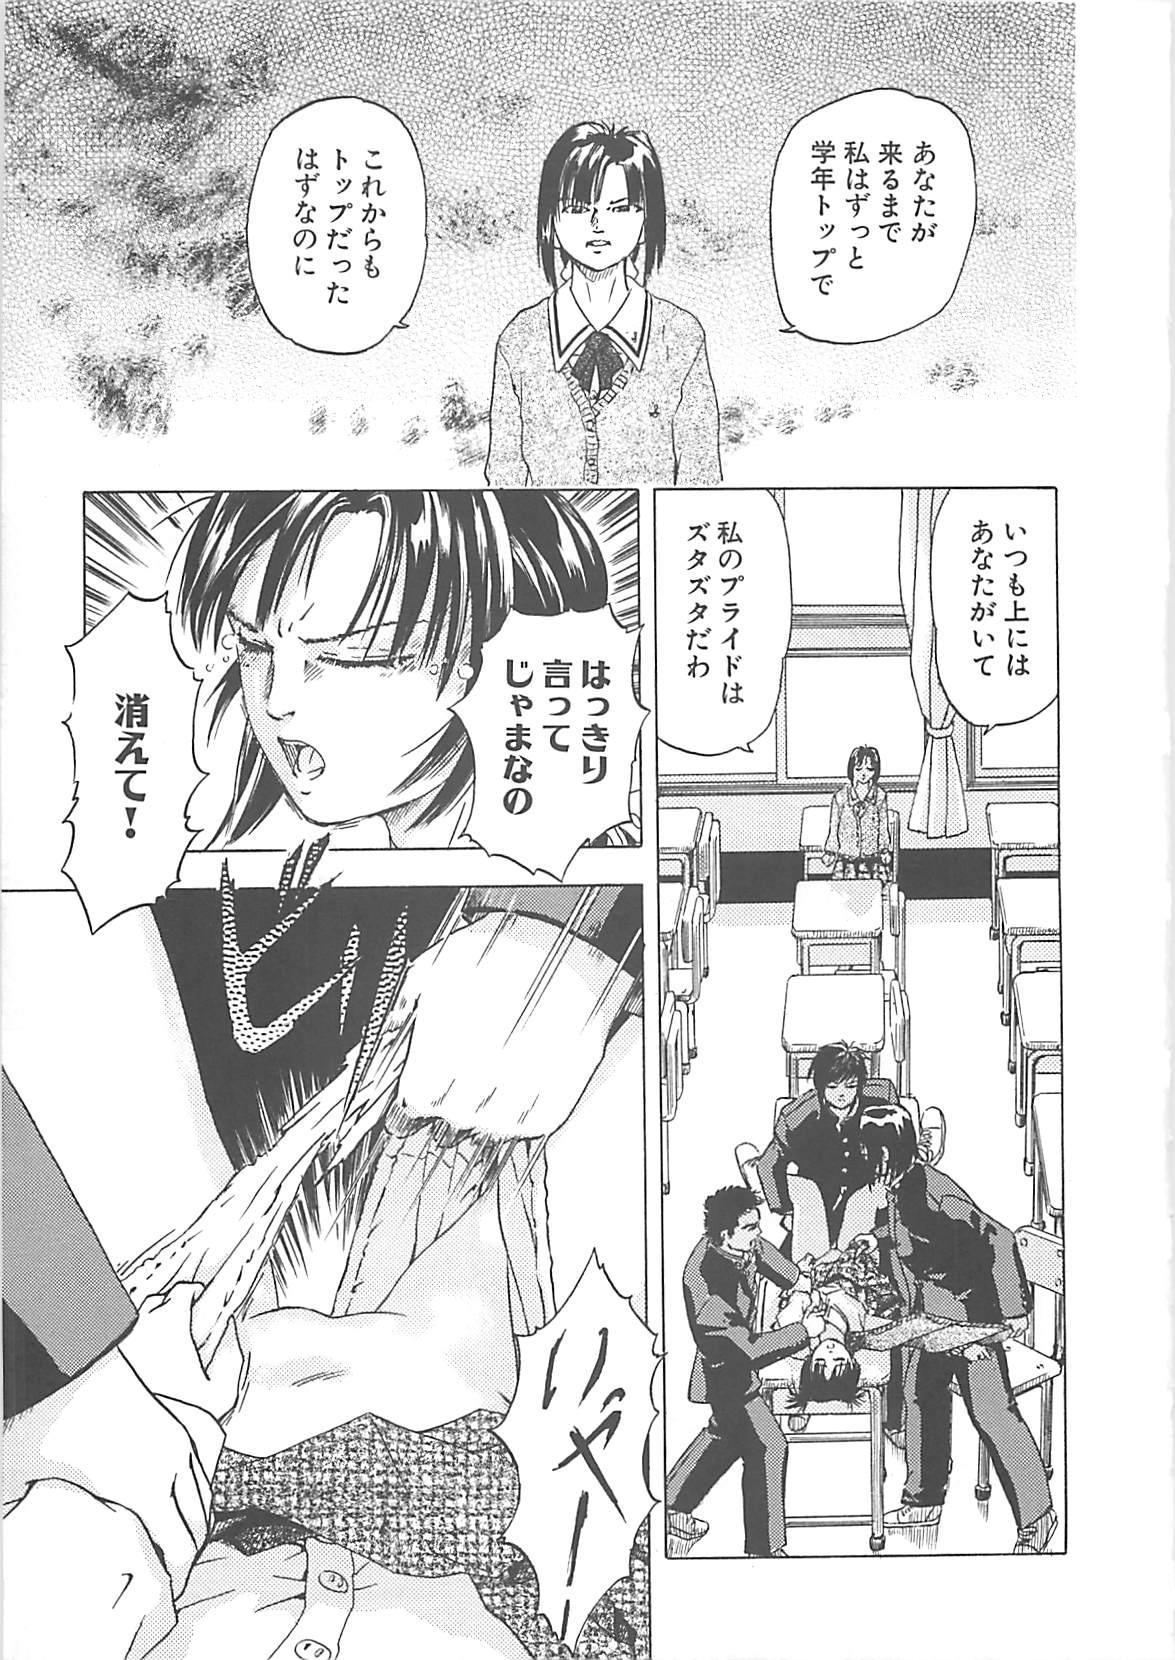 Kanin Kyoushitsu - Adultery Classroom 103